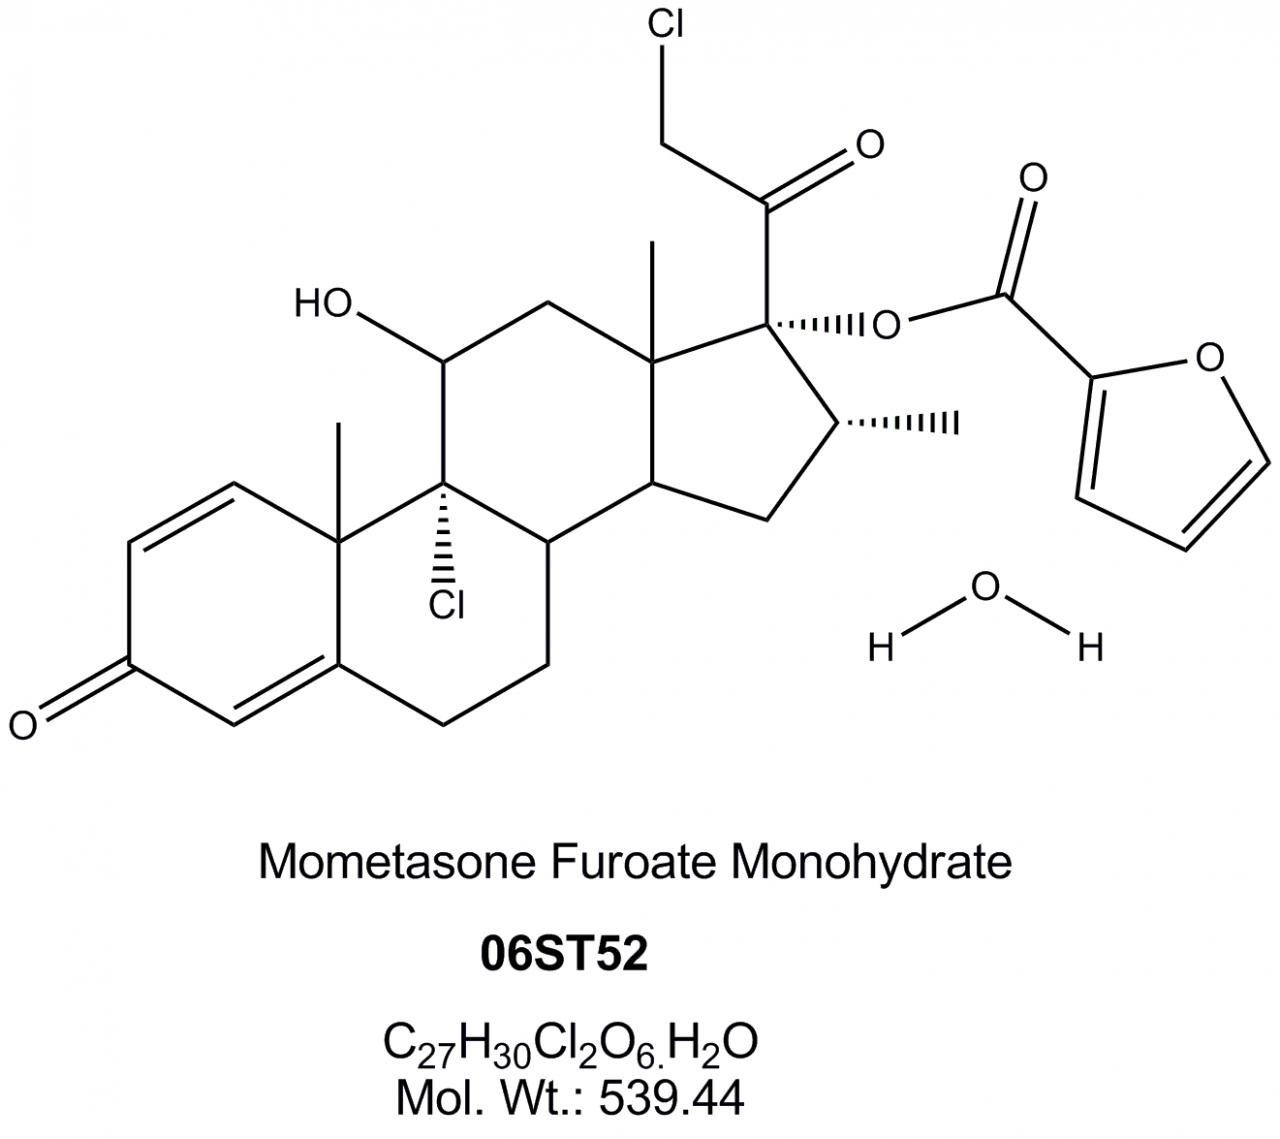 Mometasone Furoate Monohydrate